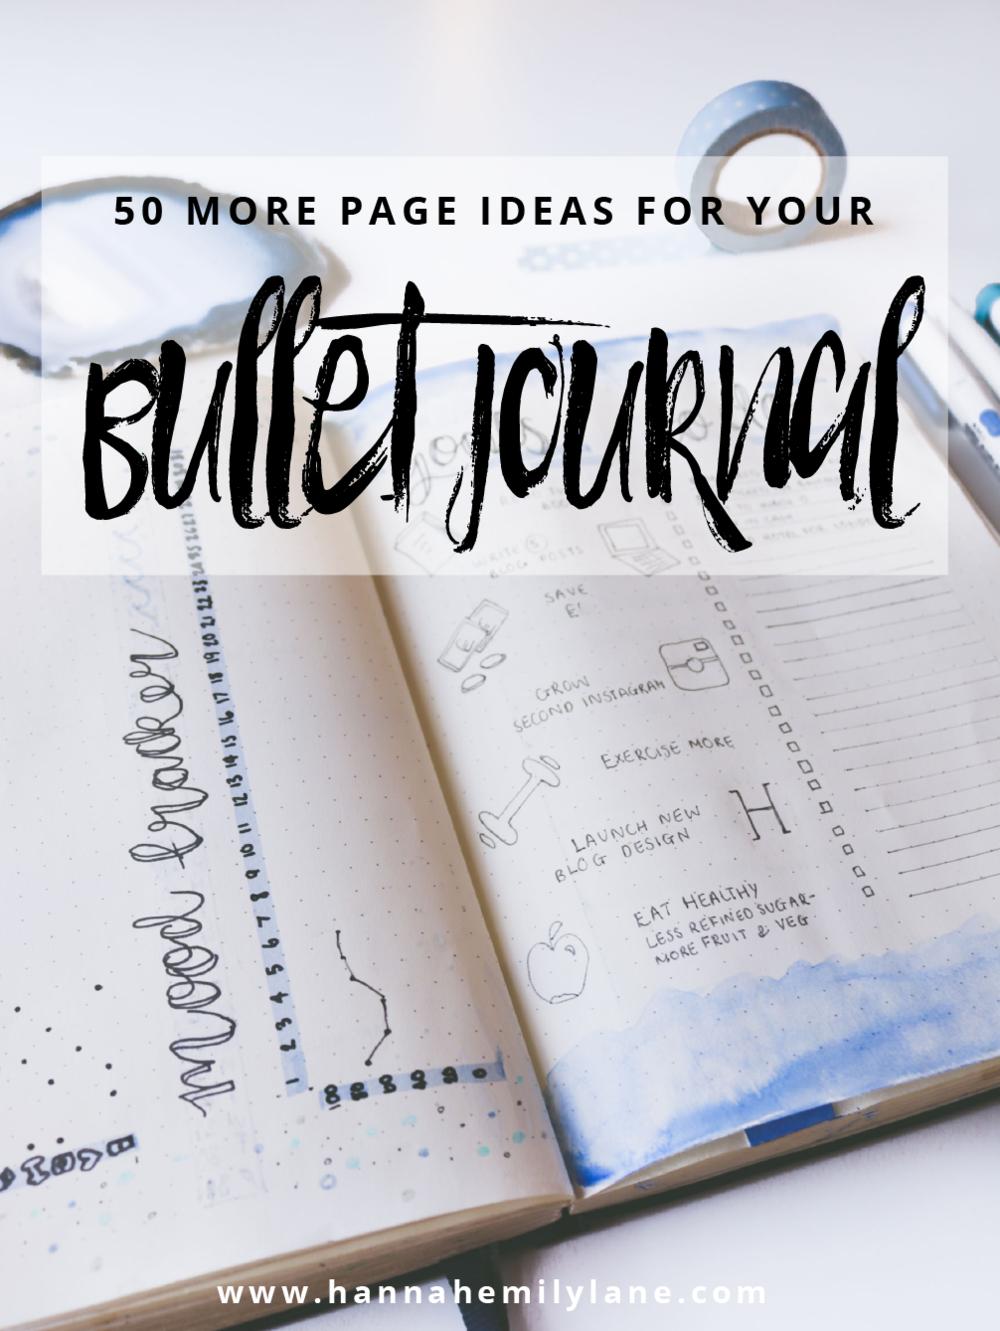 50 Page Ideas for your Bullet Journal | www.hannahemilylane.com